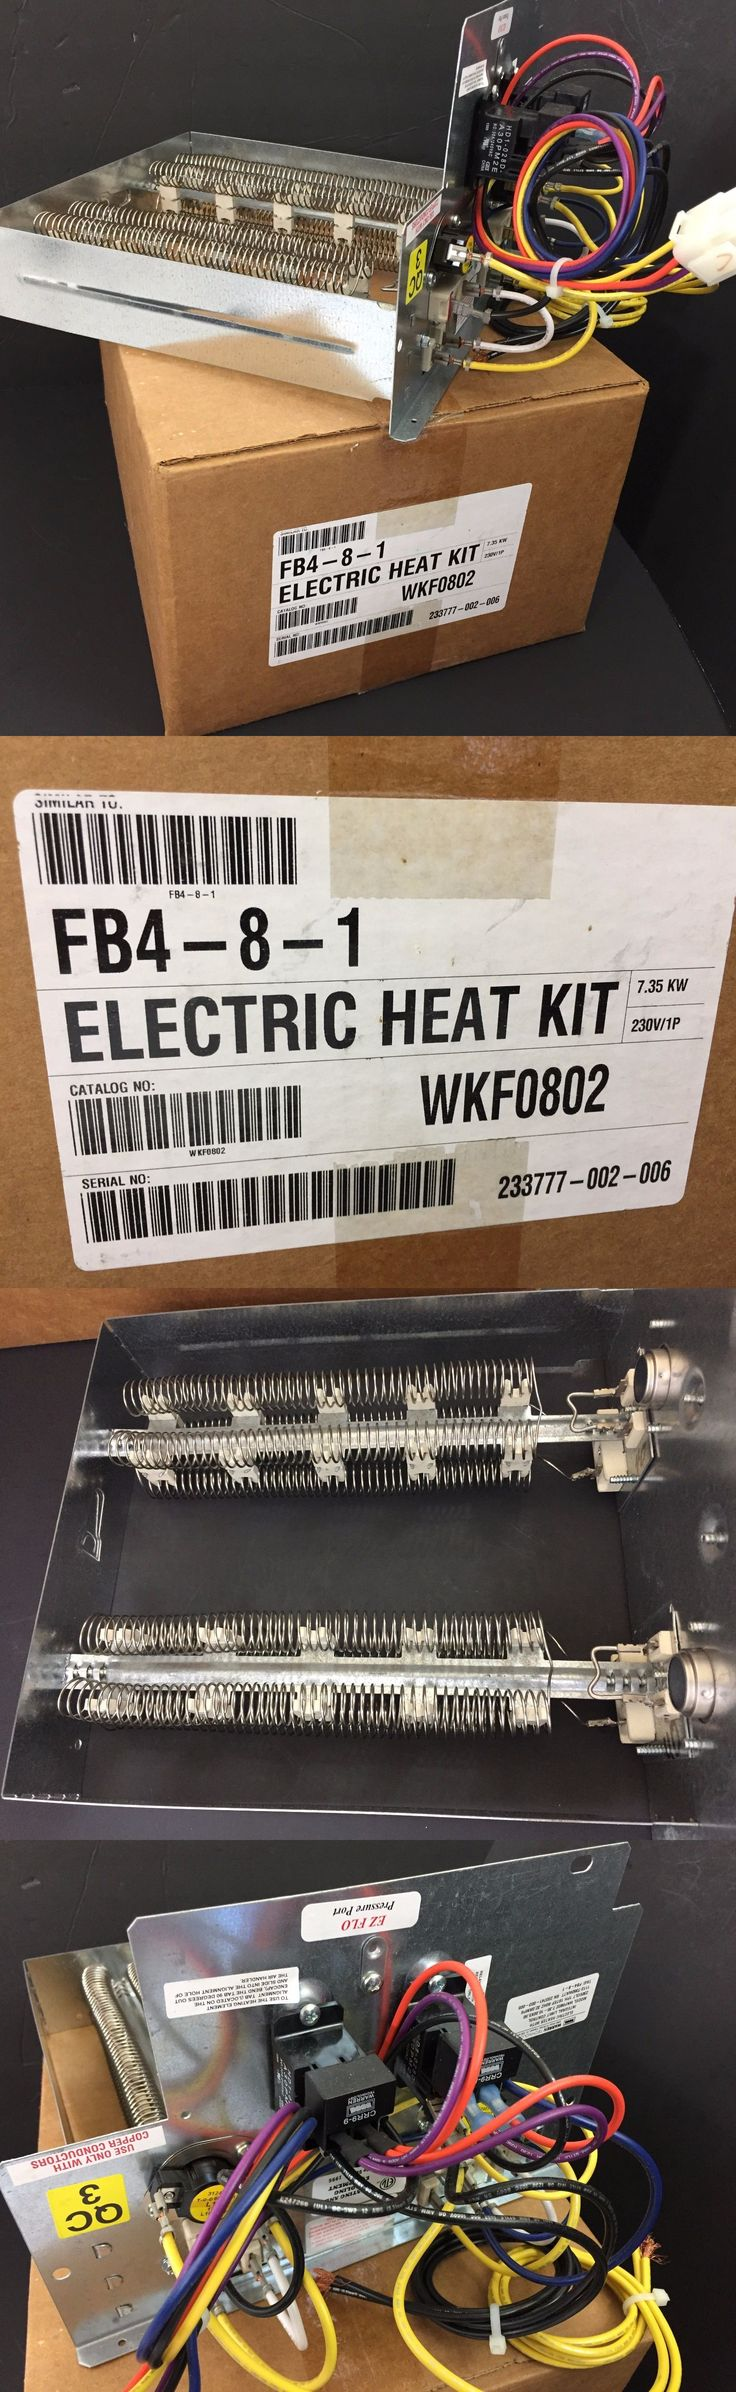 Heat recovery ventilator ebay - Furnaces And Heating Systems 41987 Warren Wkf0802 7 35 Kw Electric Heater Kit Heat Strip